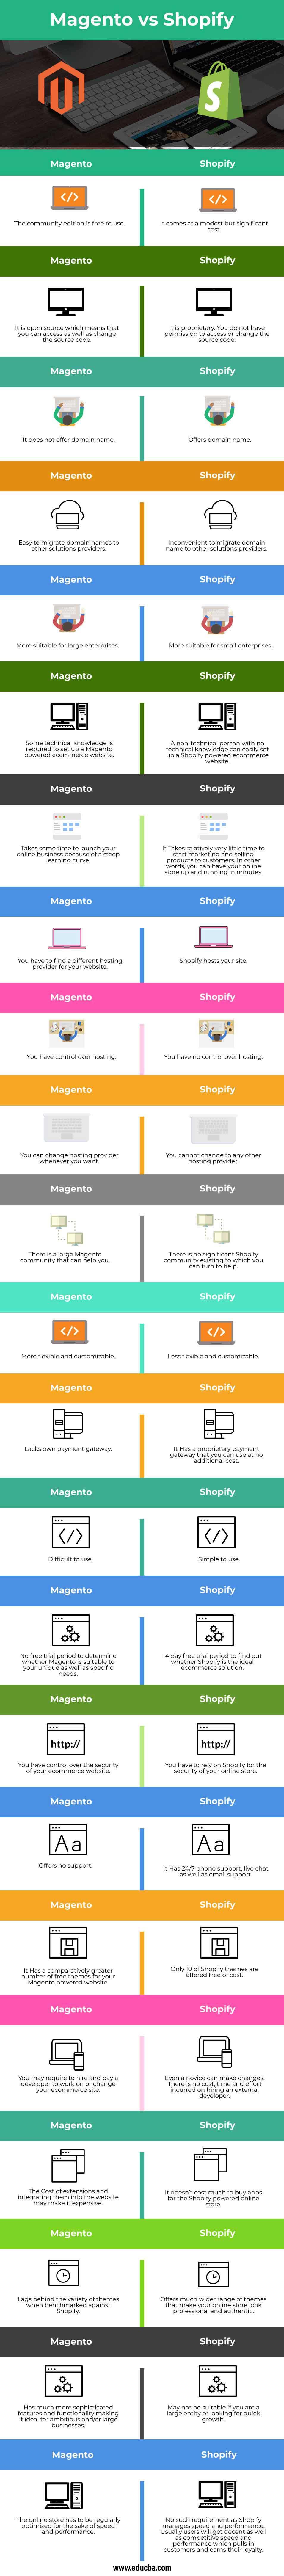 Magento vs Shopify info